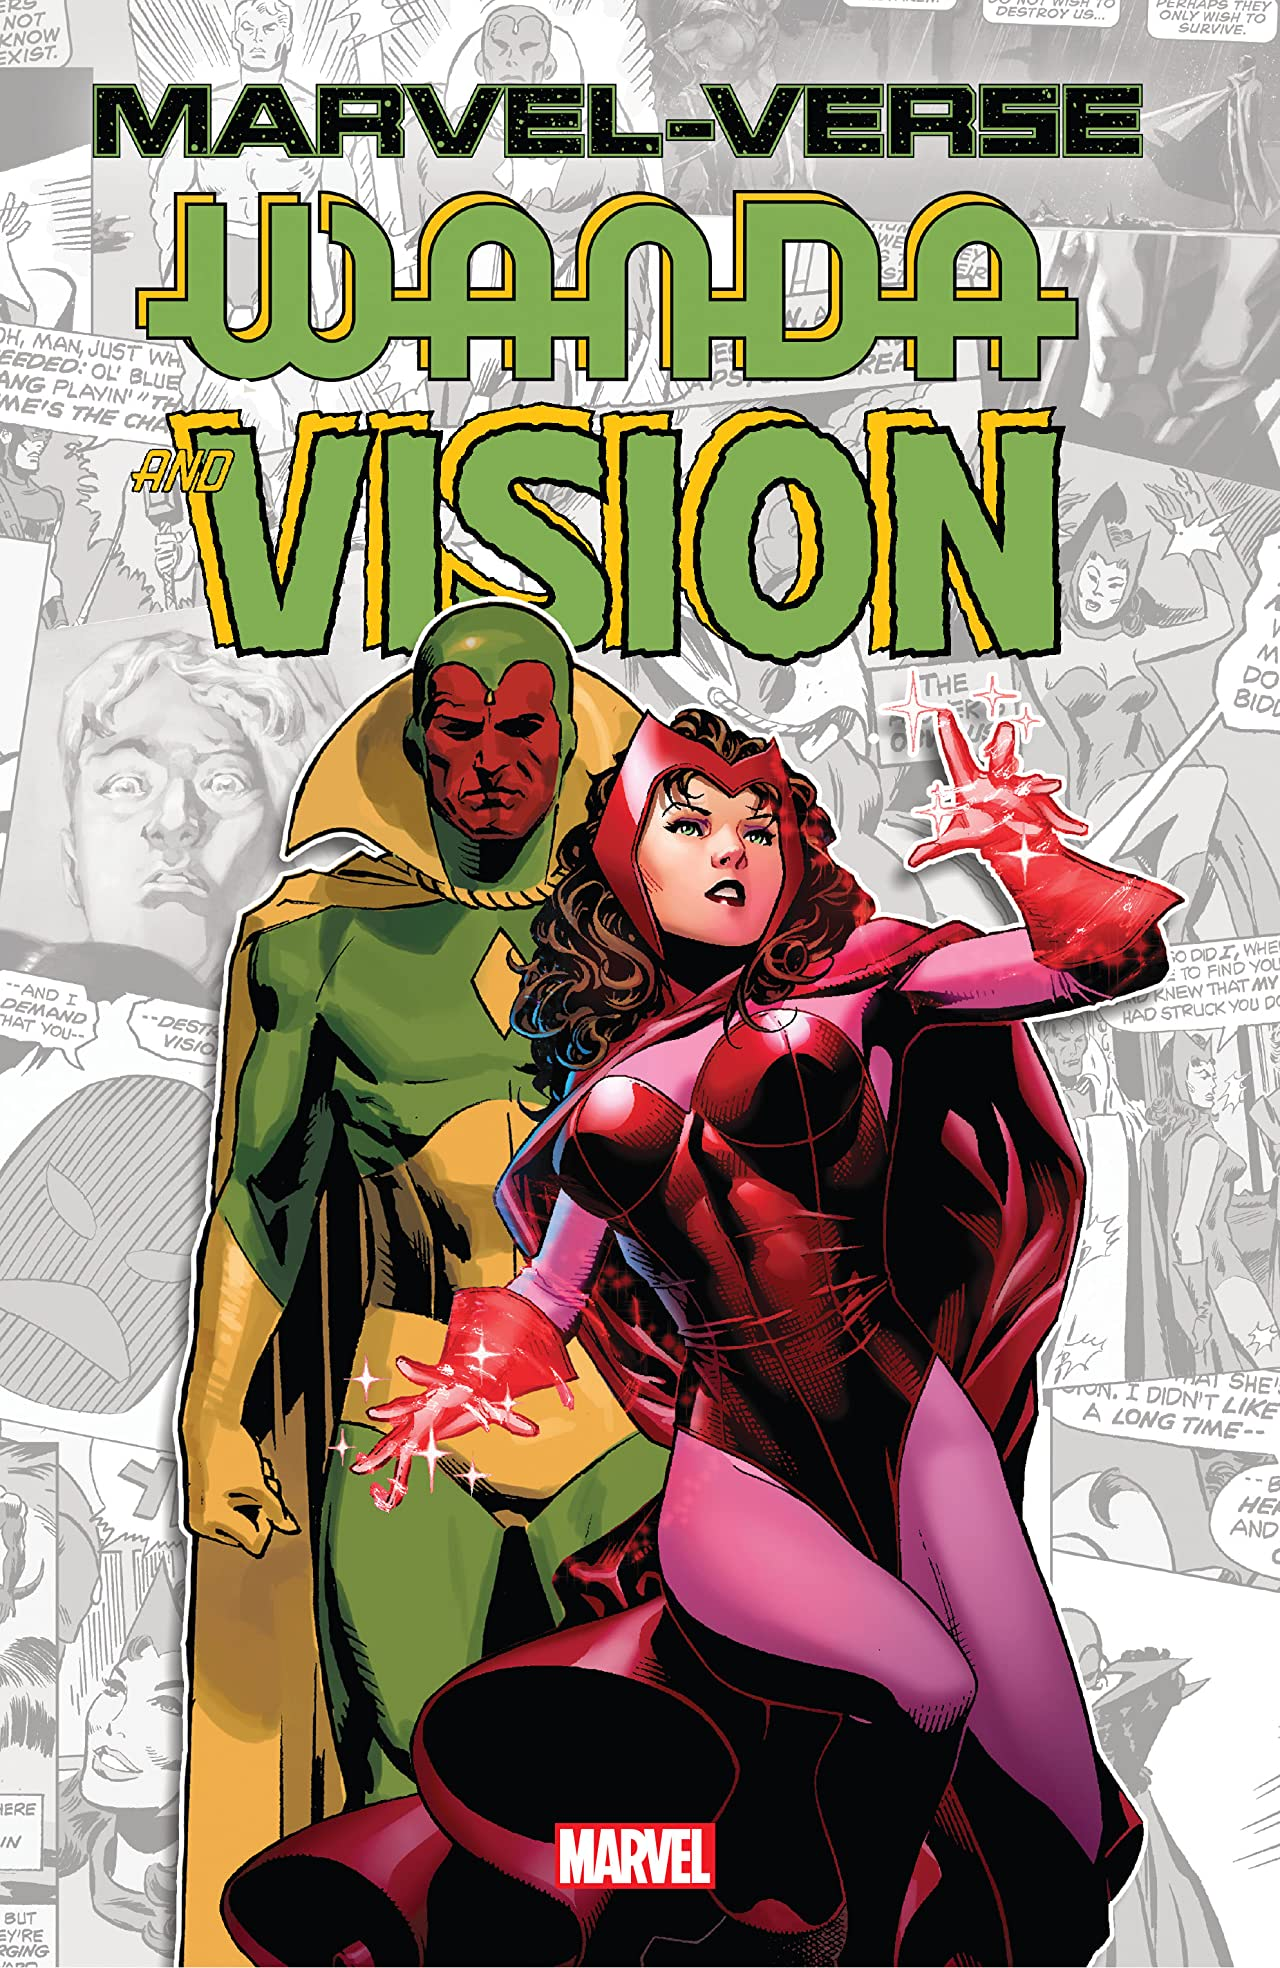 Marvel-Verse: Wanda & Vision (Trade Paperback)